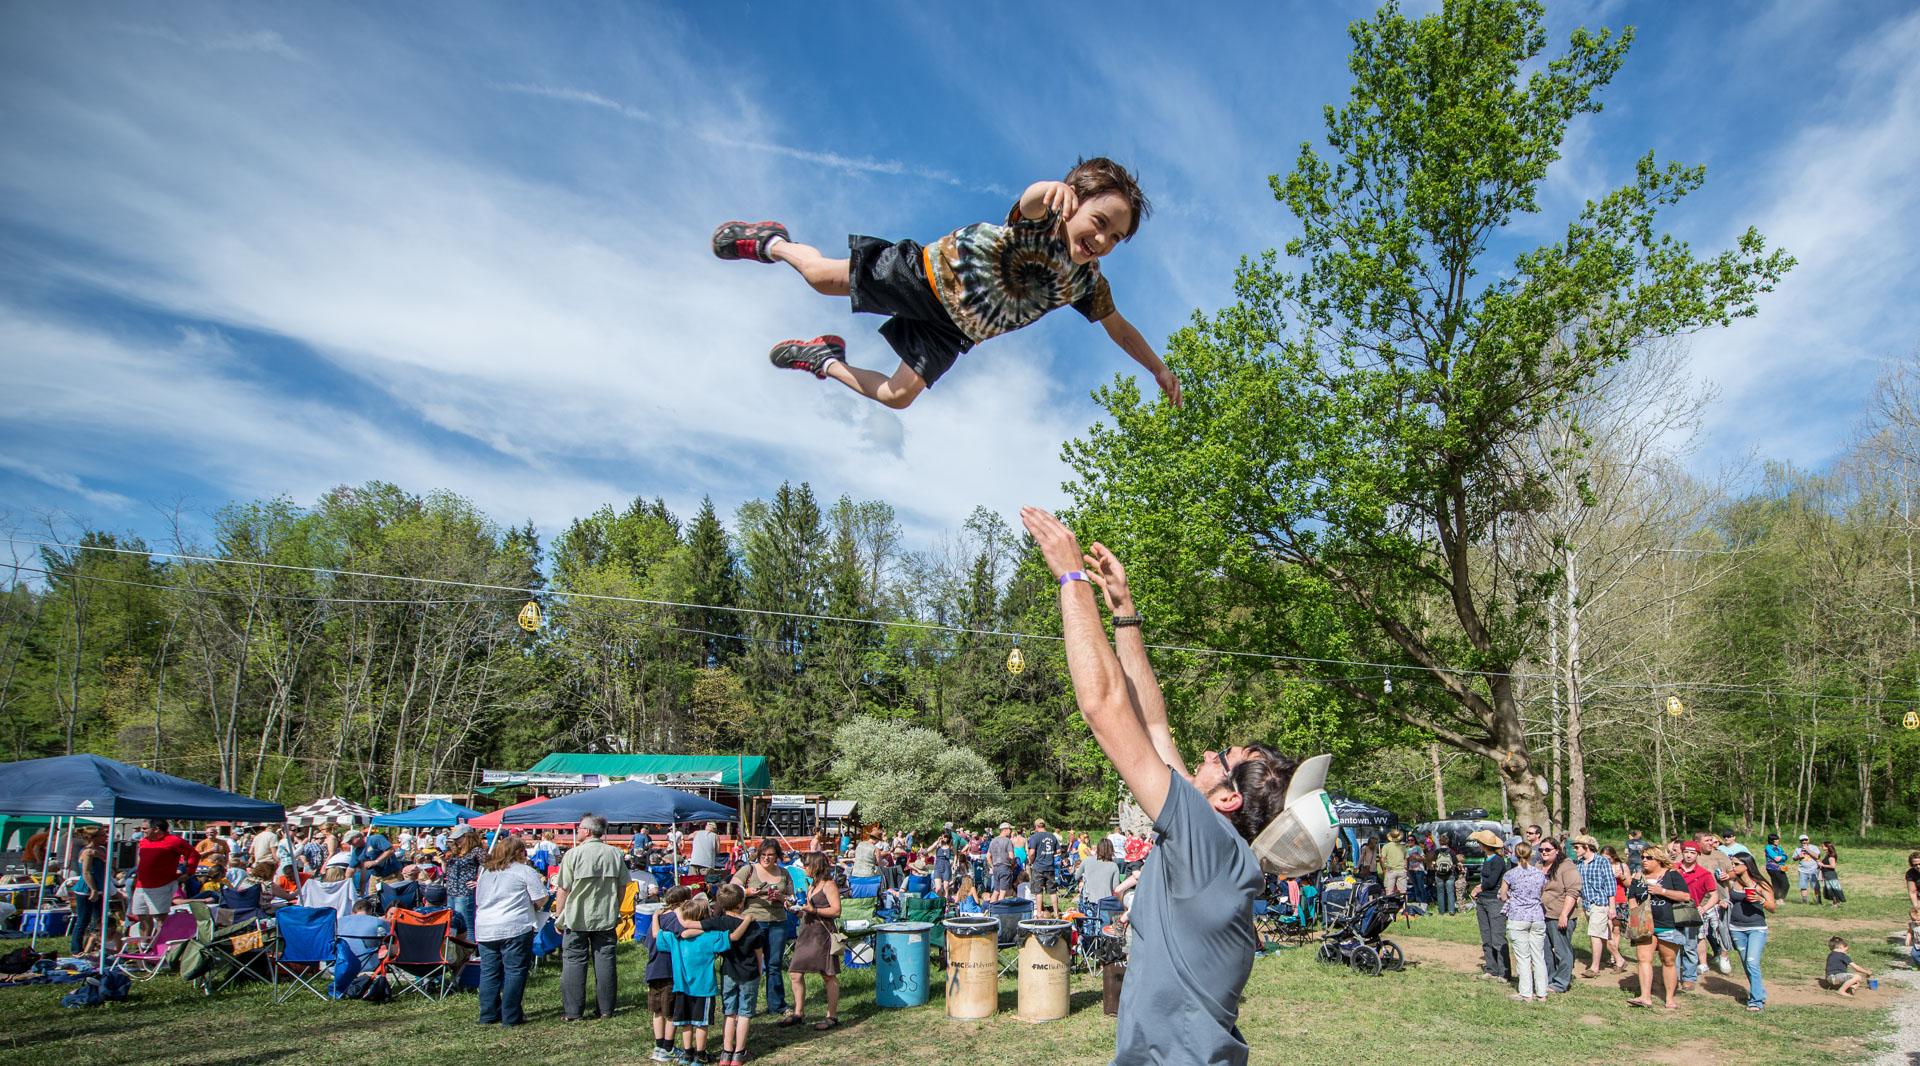 Albright, Cheat Fest, Cheat River Festival, Events, Music, Places, West Virginia